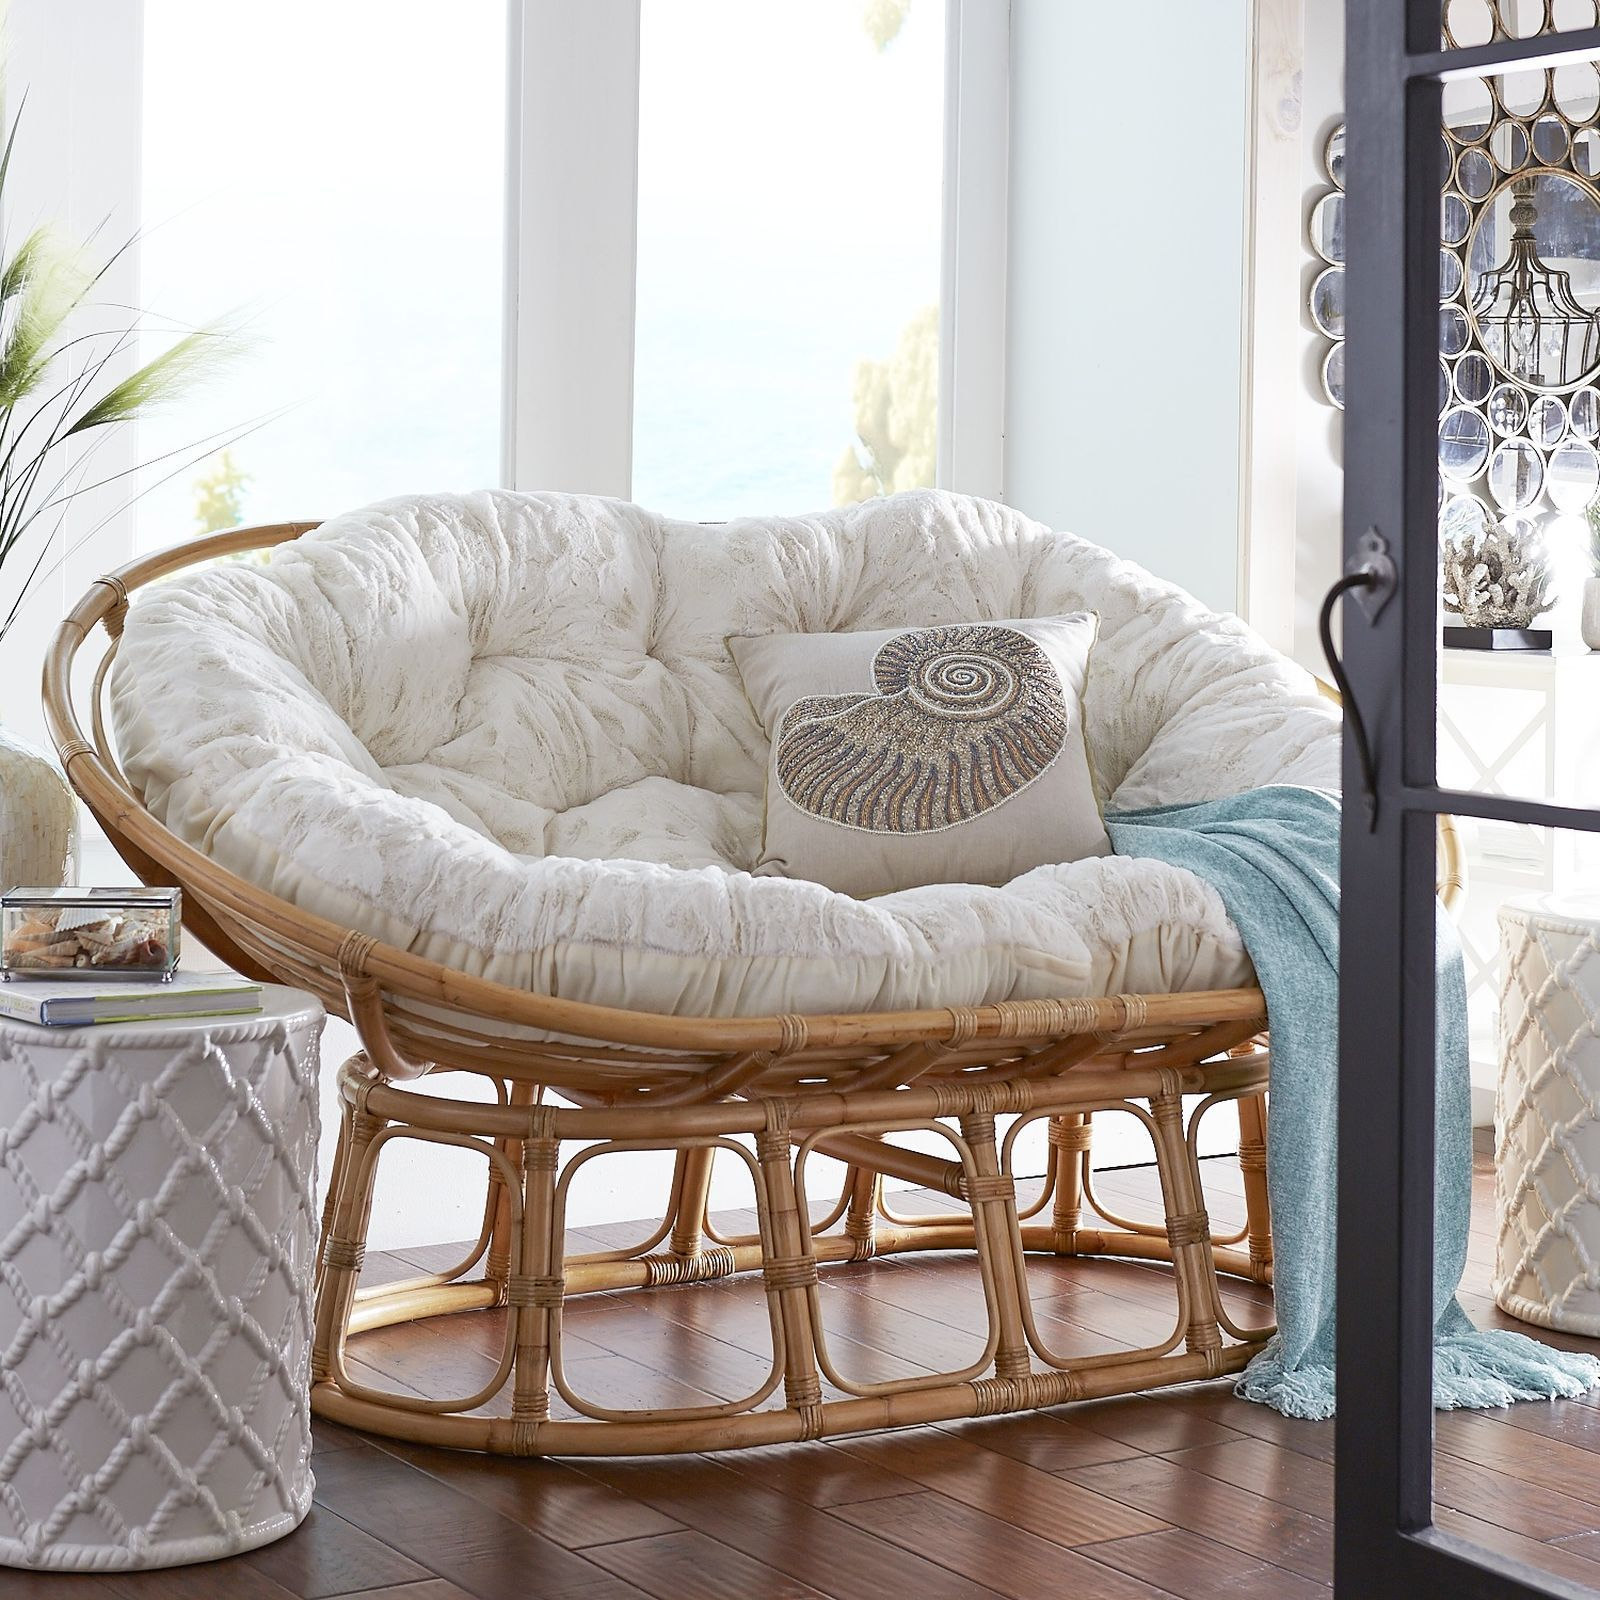 Papasan Double Natural Chair Frame Papasan Chair And Rattan